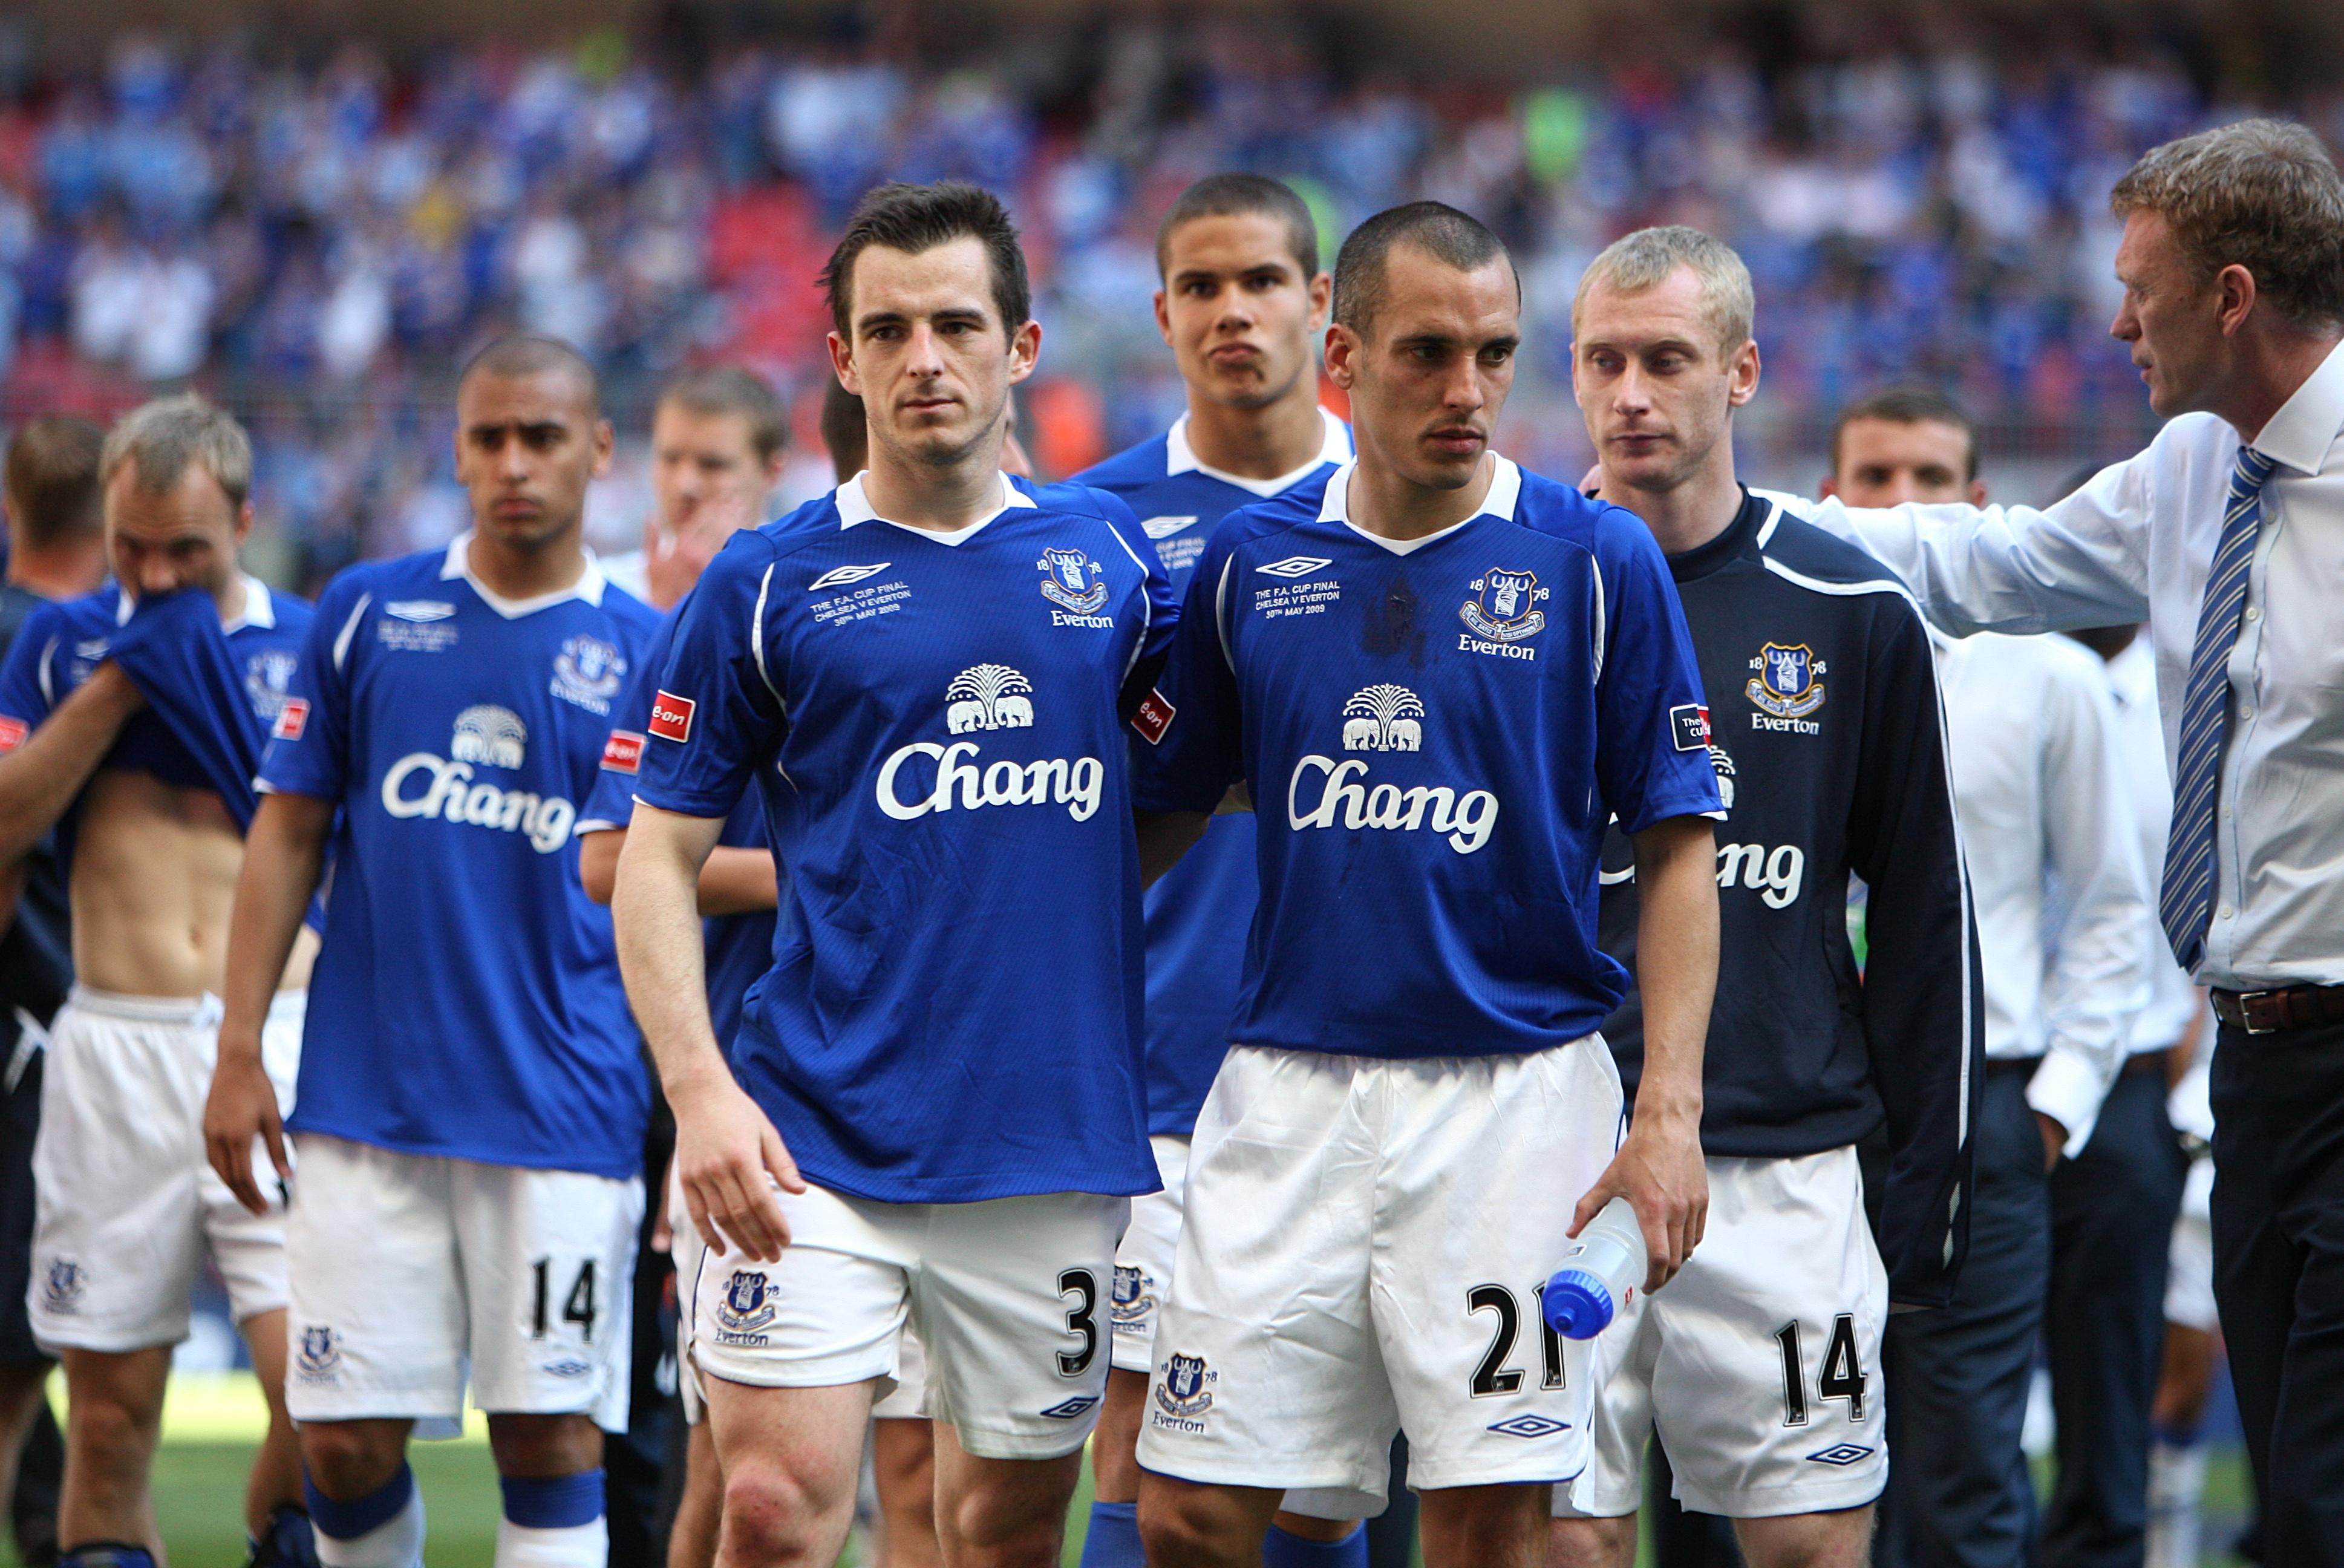 Soccer - FA Cup - Final - Chelsea v Everton - Wembley Stadium